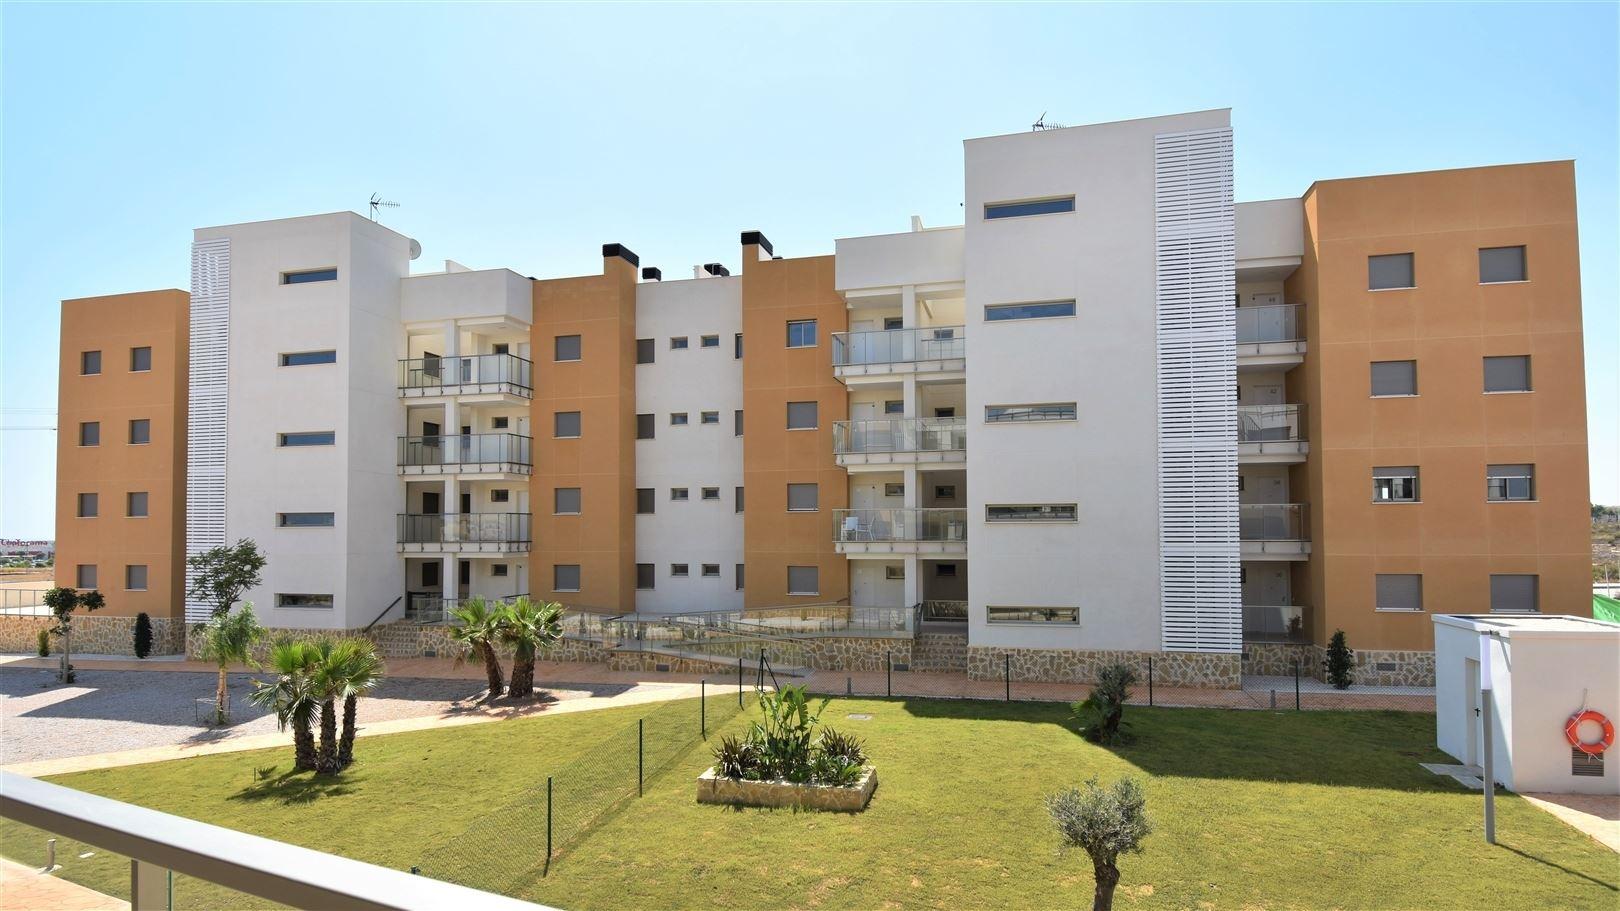 Foto 1 : Appartement te   (Spanje) - Prijs € 186.000